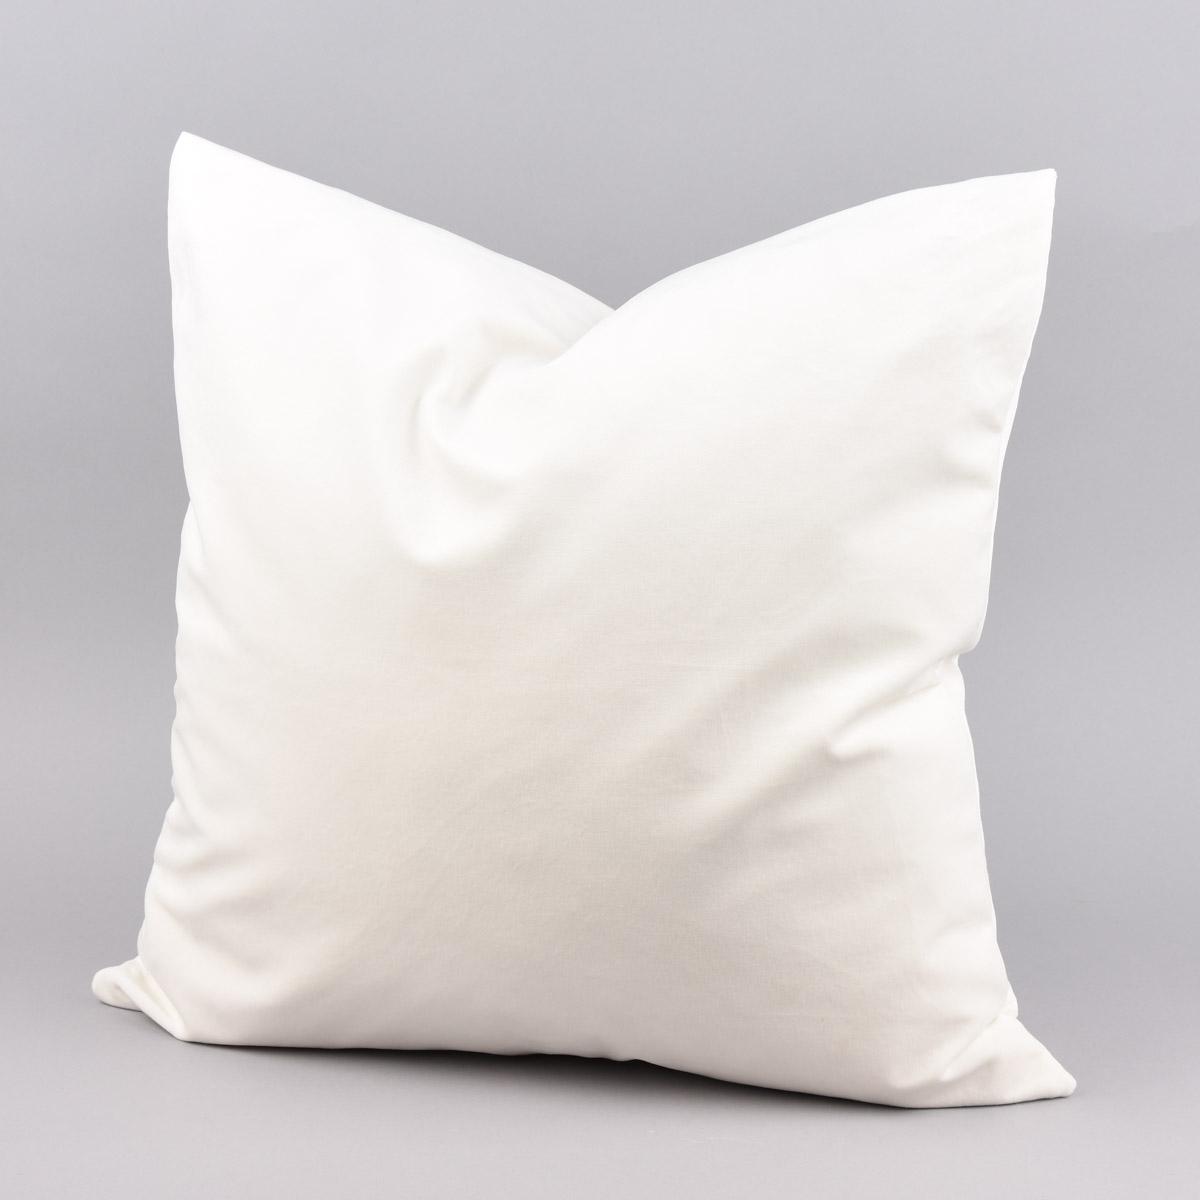 Kissenhülle Duval Samtoptik weiß 50x50cm